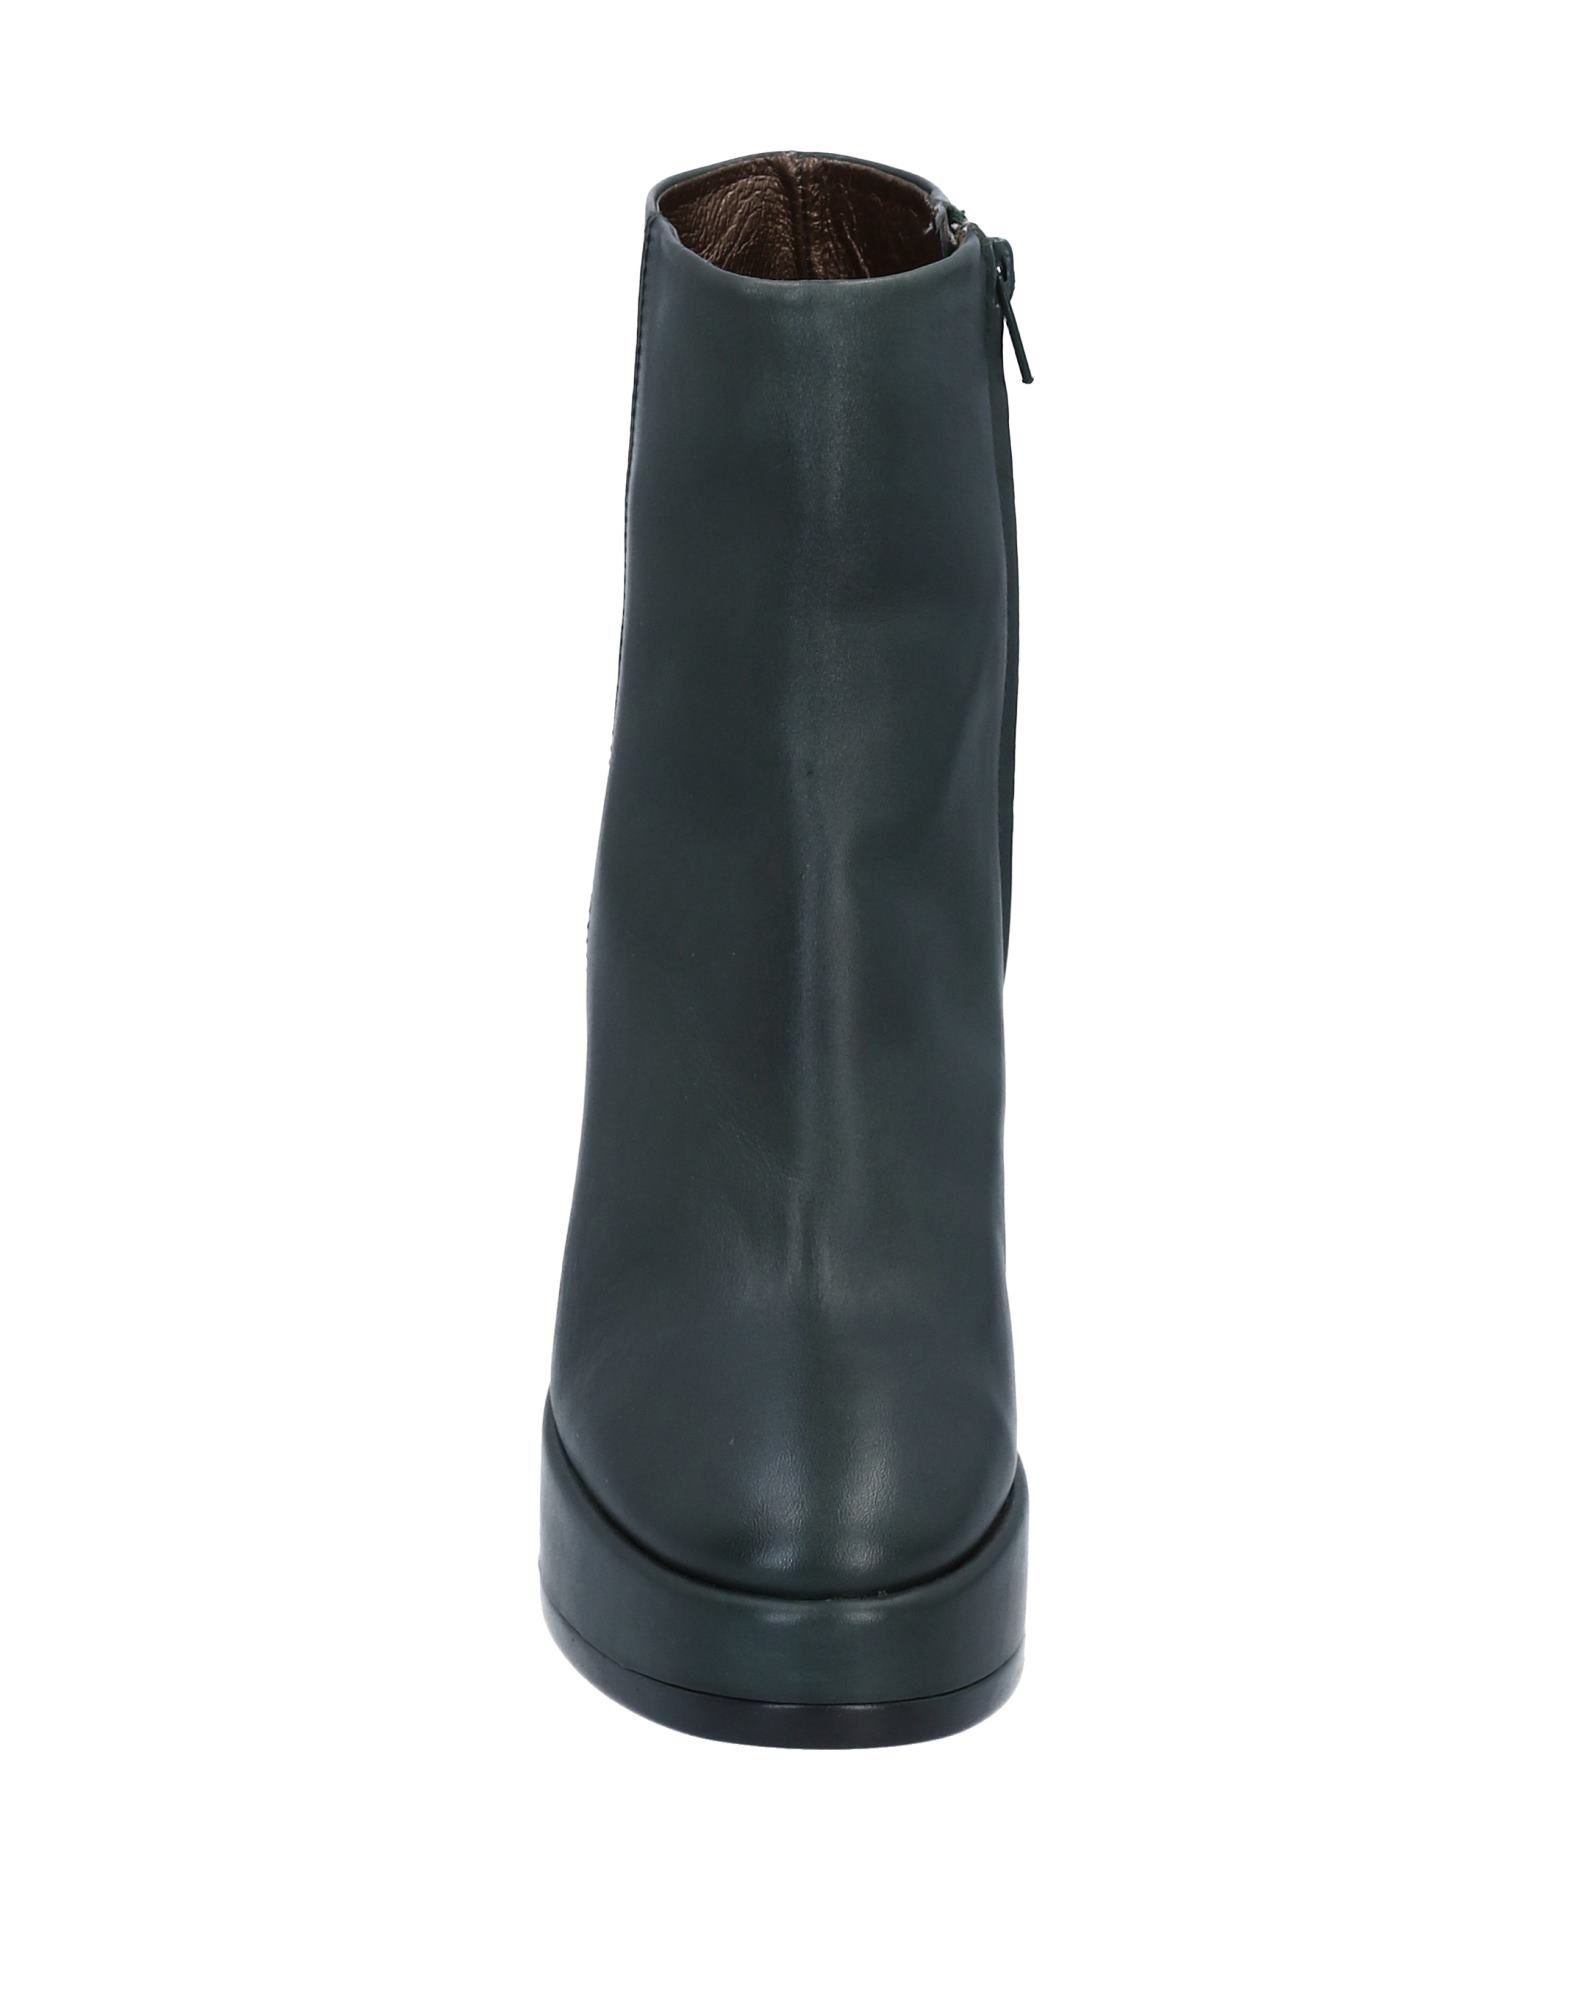 Pf16 Stiefelette Damen  11513779PN 11513779PN 11513779PN Gute Qualität beliebte Schuhe bc7aaa